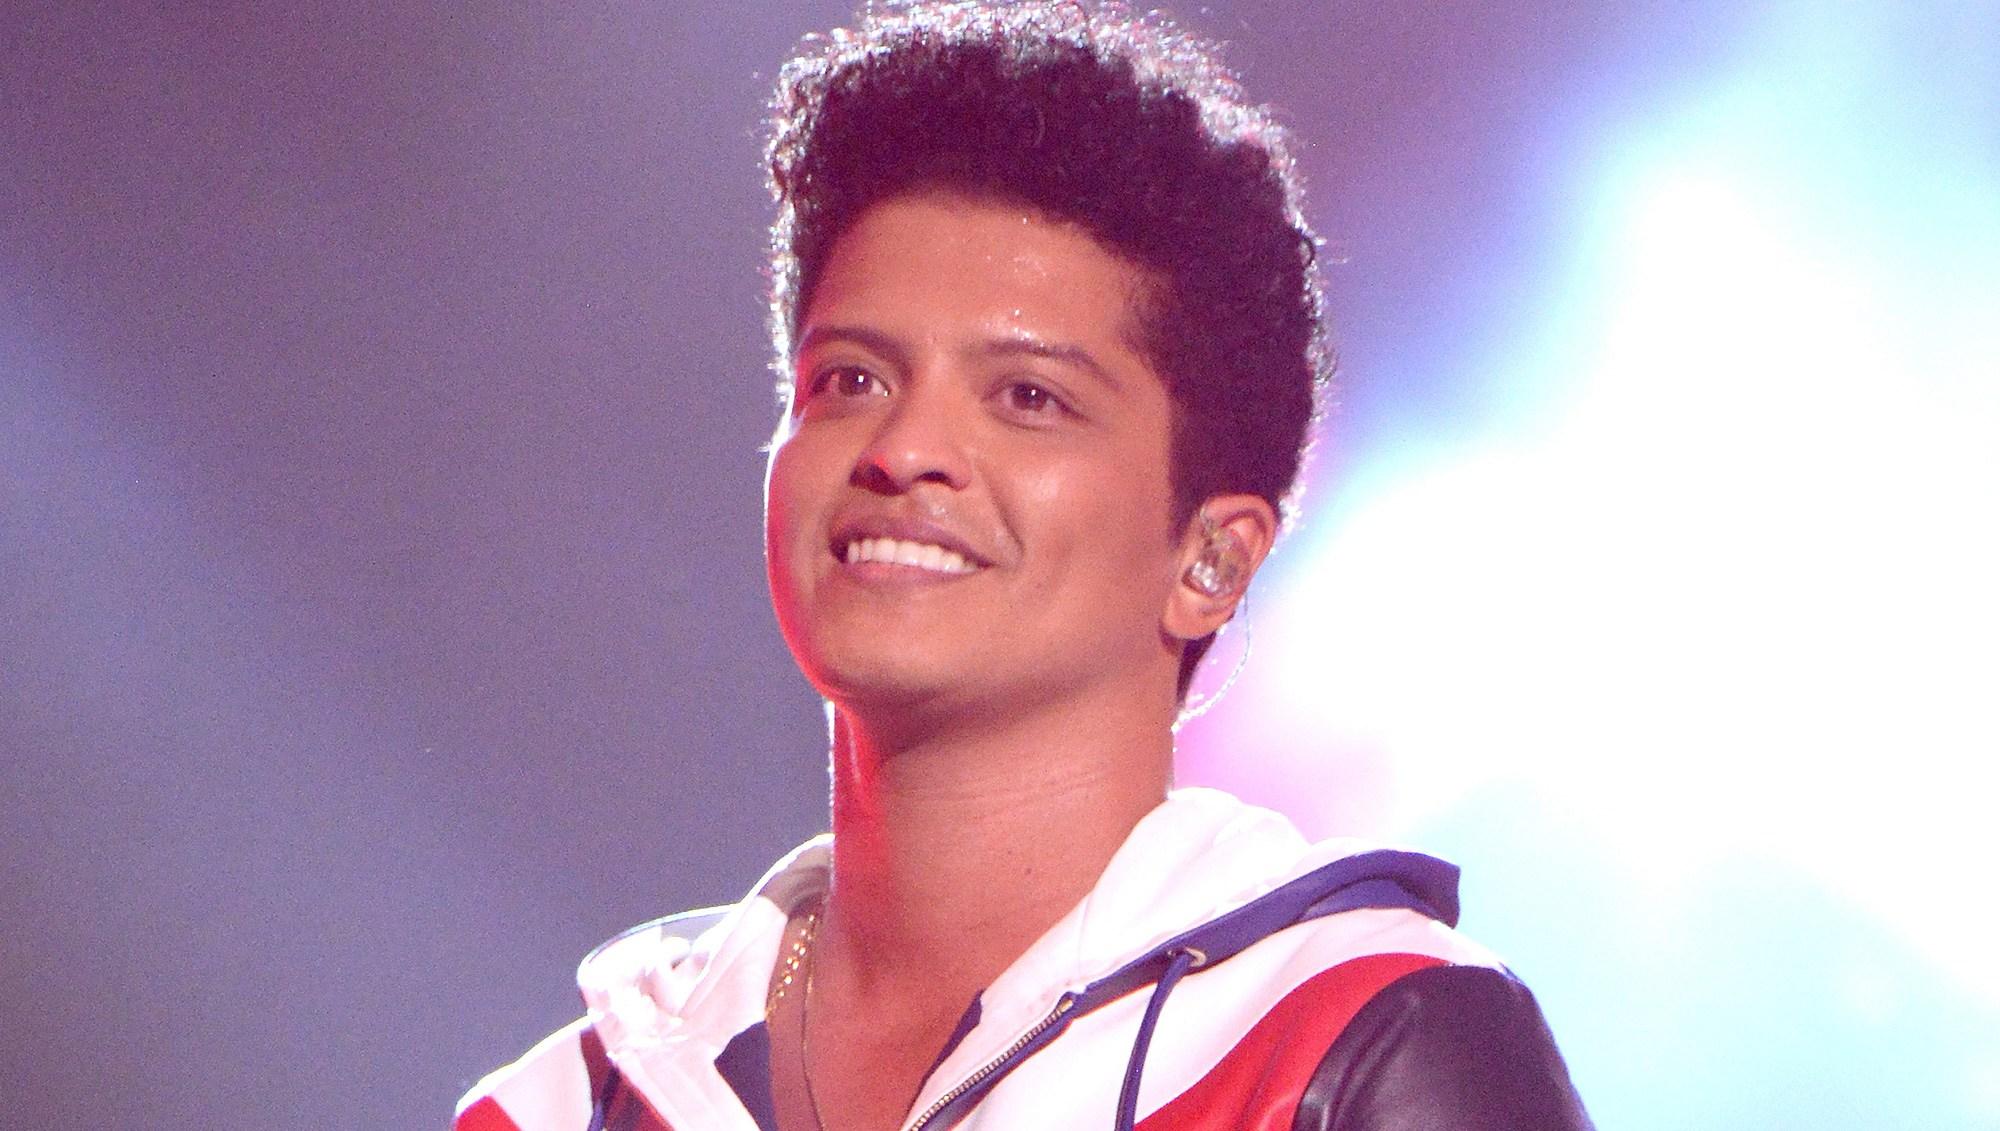 Bruno Mars, AMA, Performance